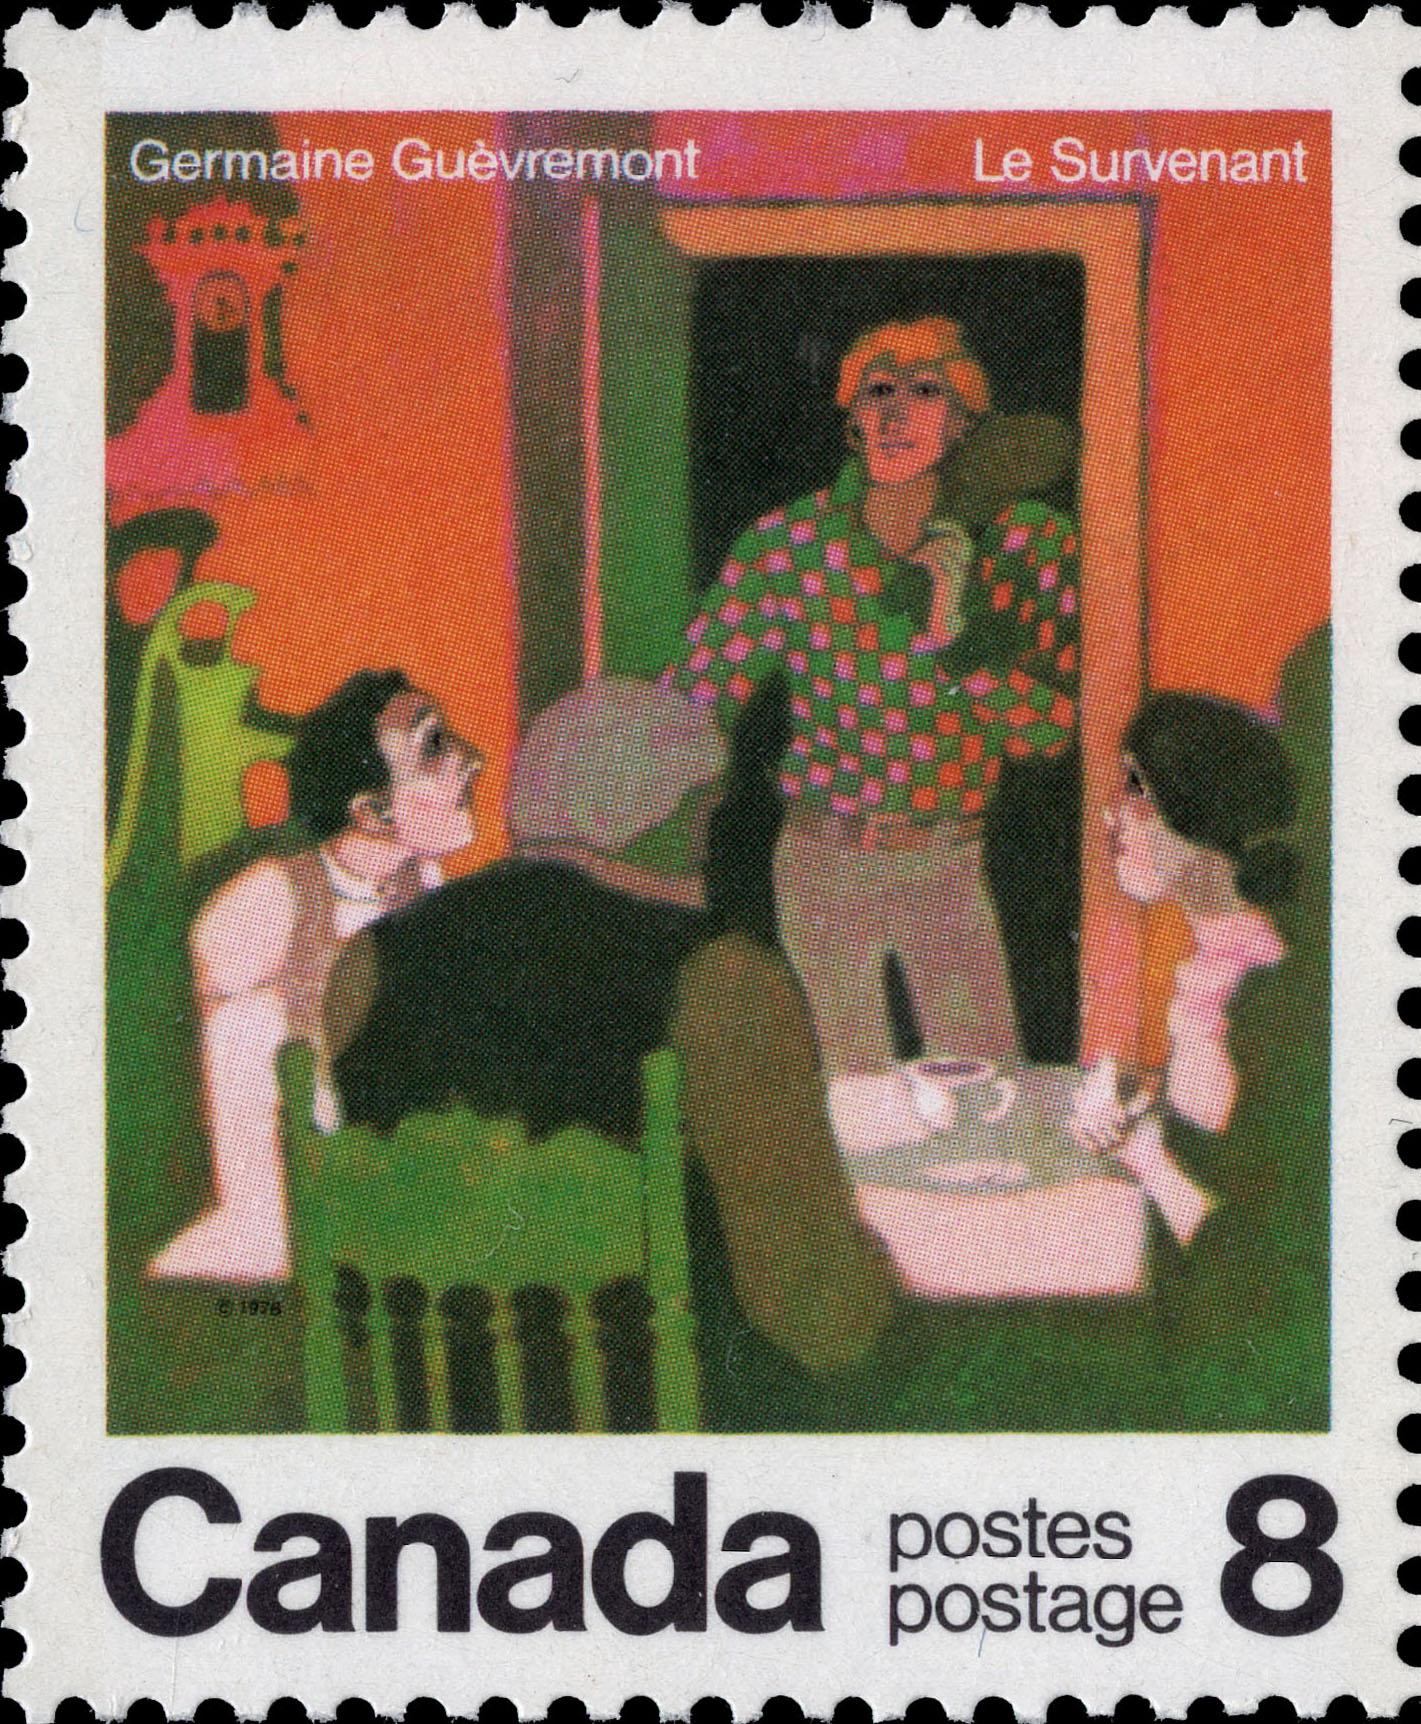 Germaine Guevremont, Le Survenant Canada Postage Stamp